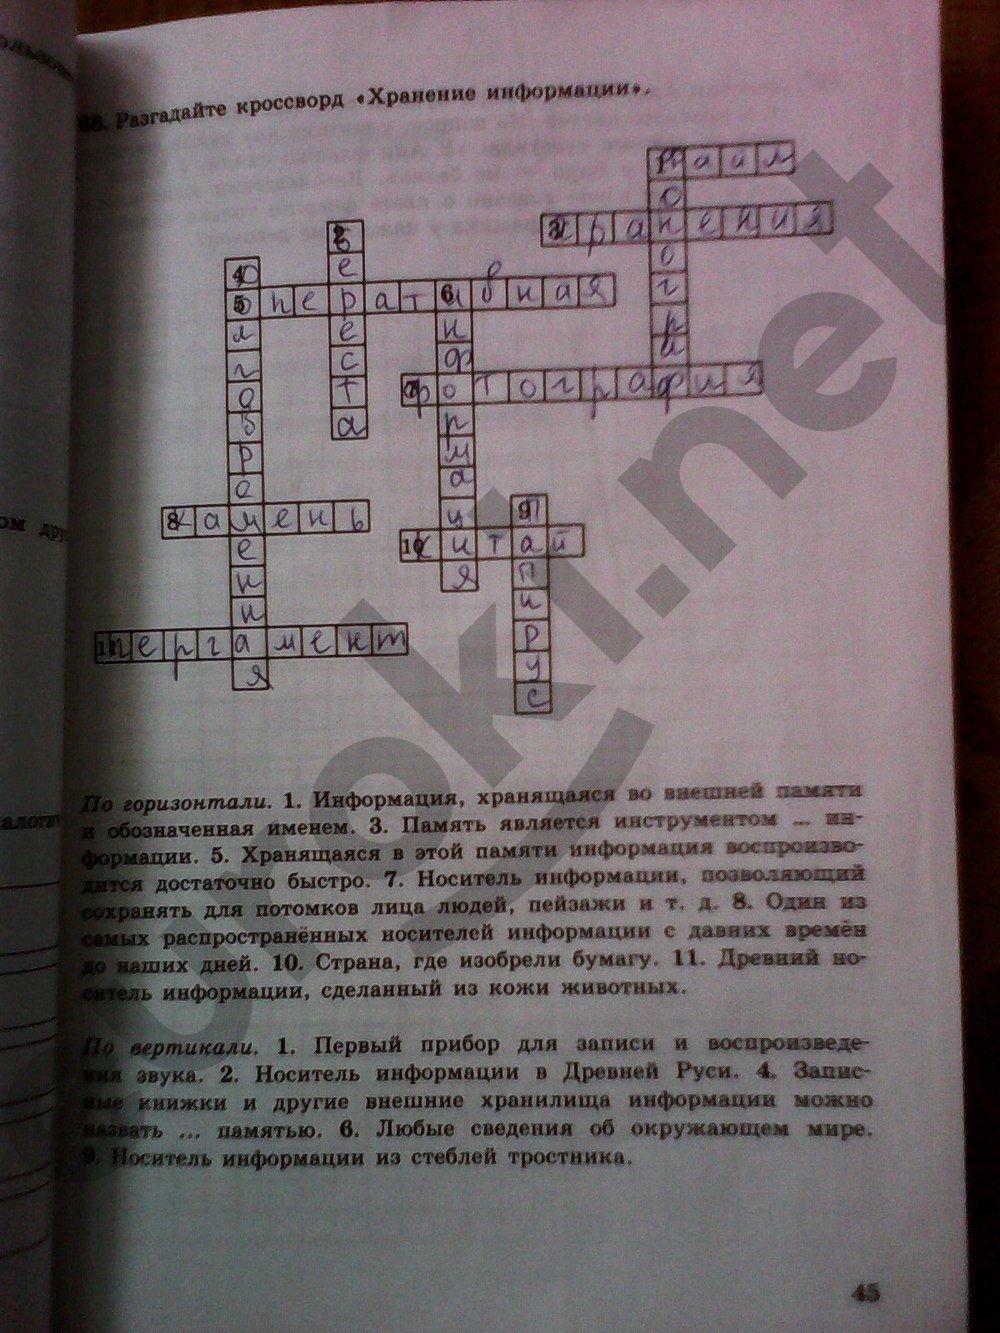 информатика 5 класс босова решебник-кроссворды